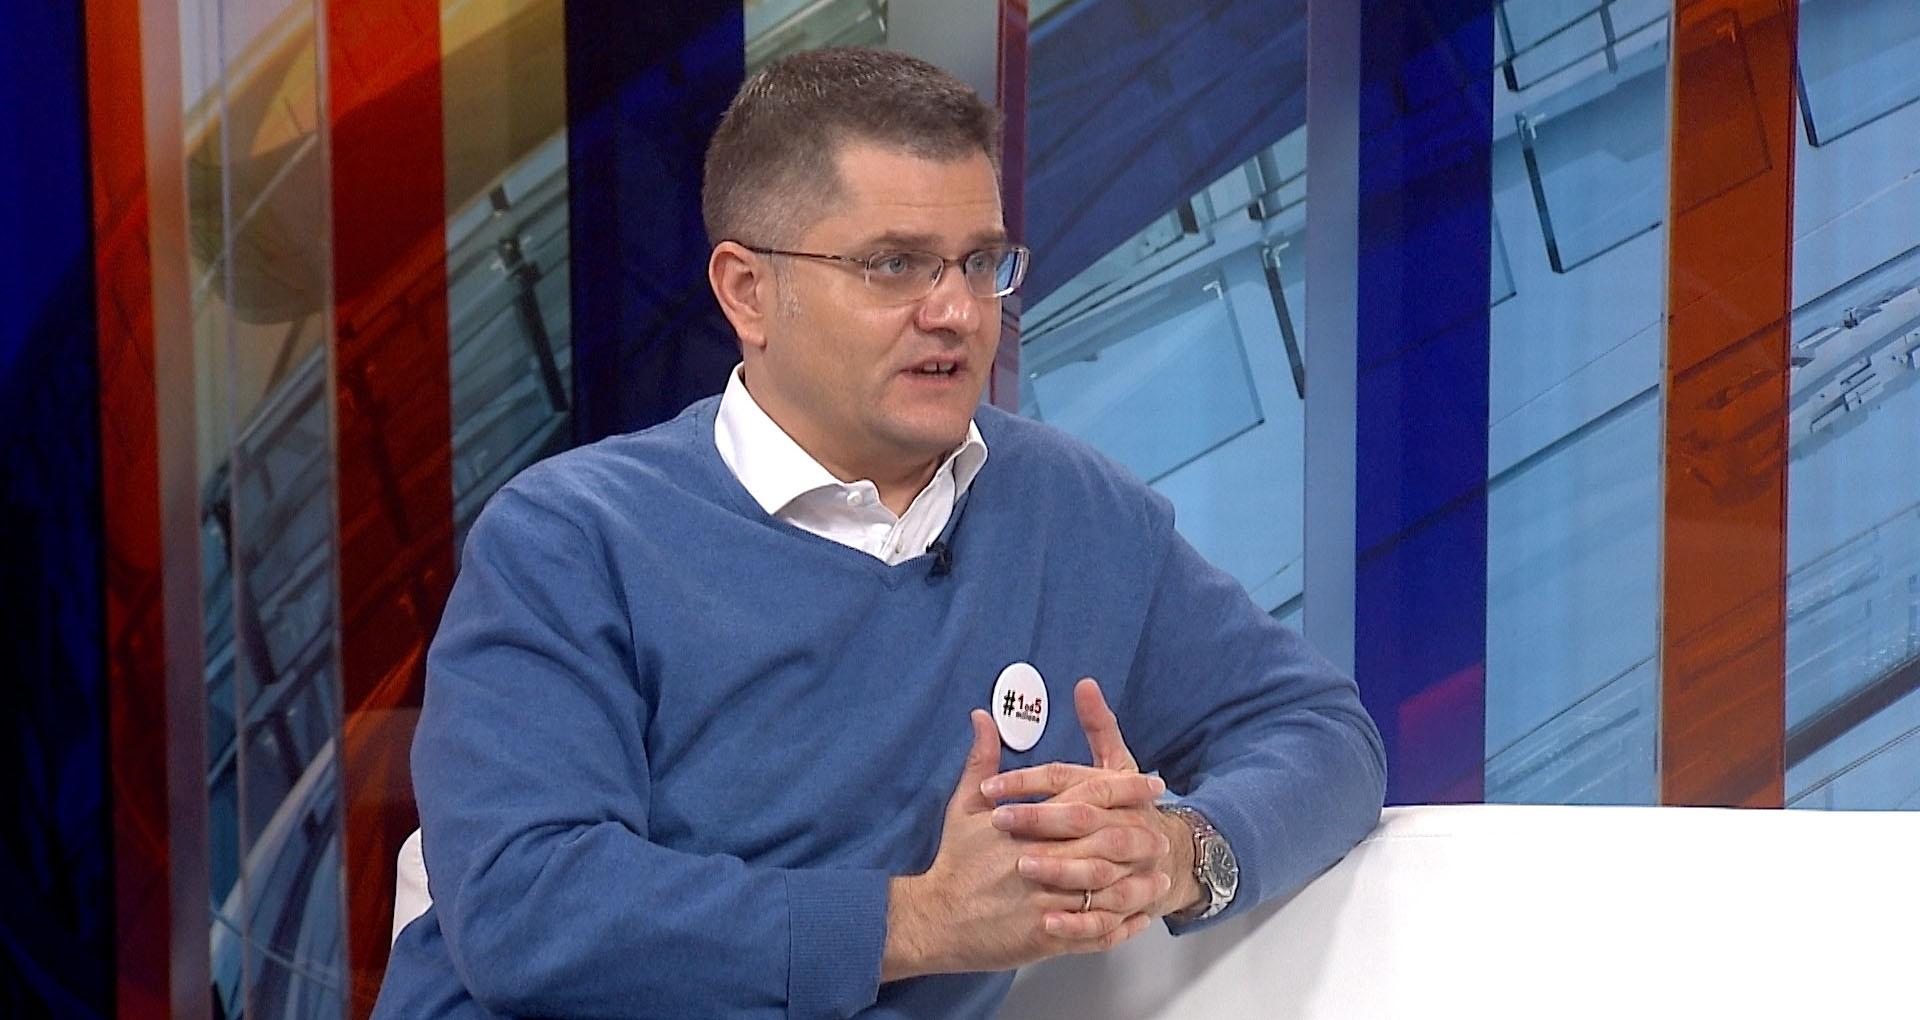 Јеремић: Никада овакви криминалци нису били на власти